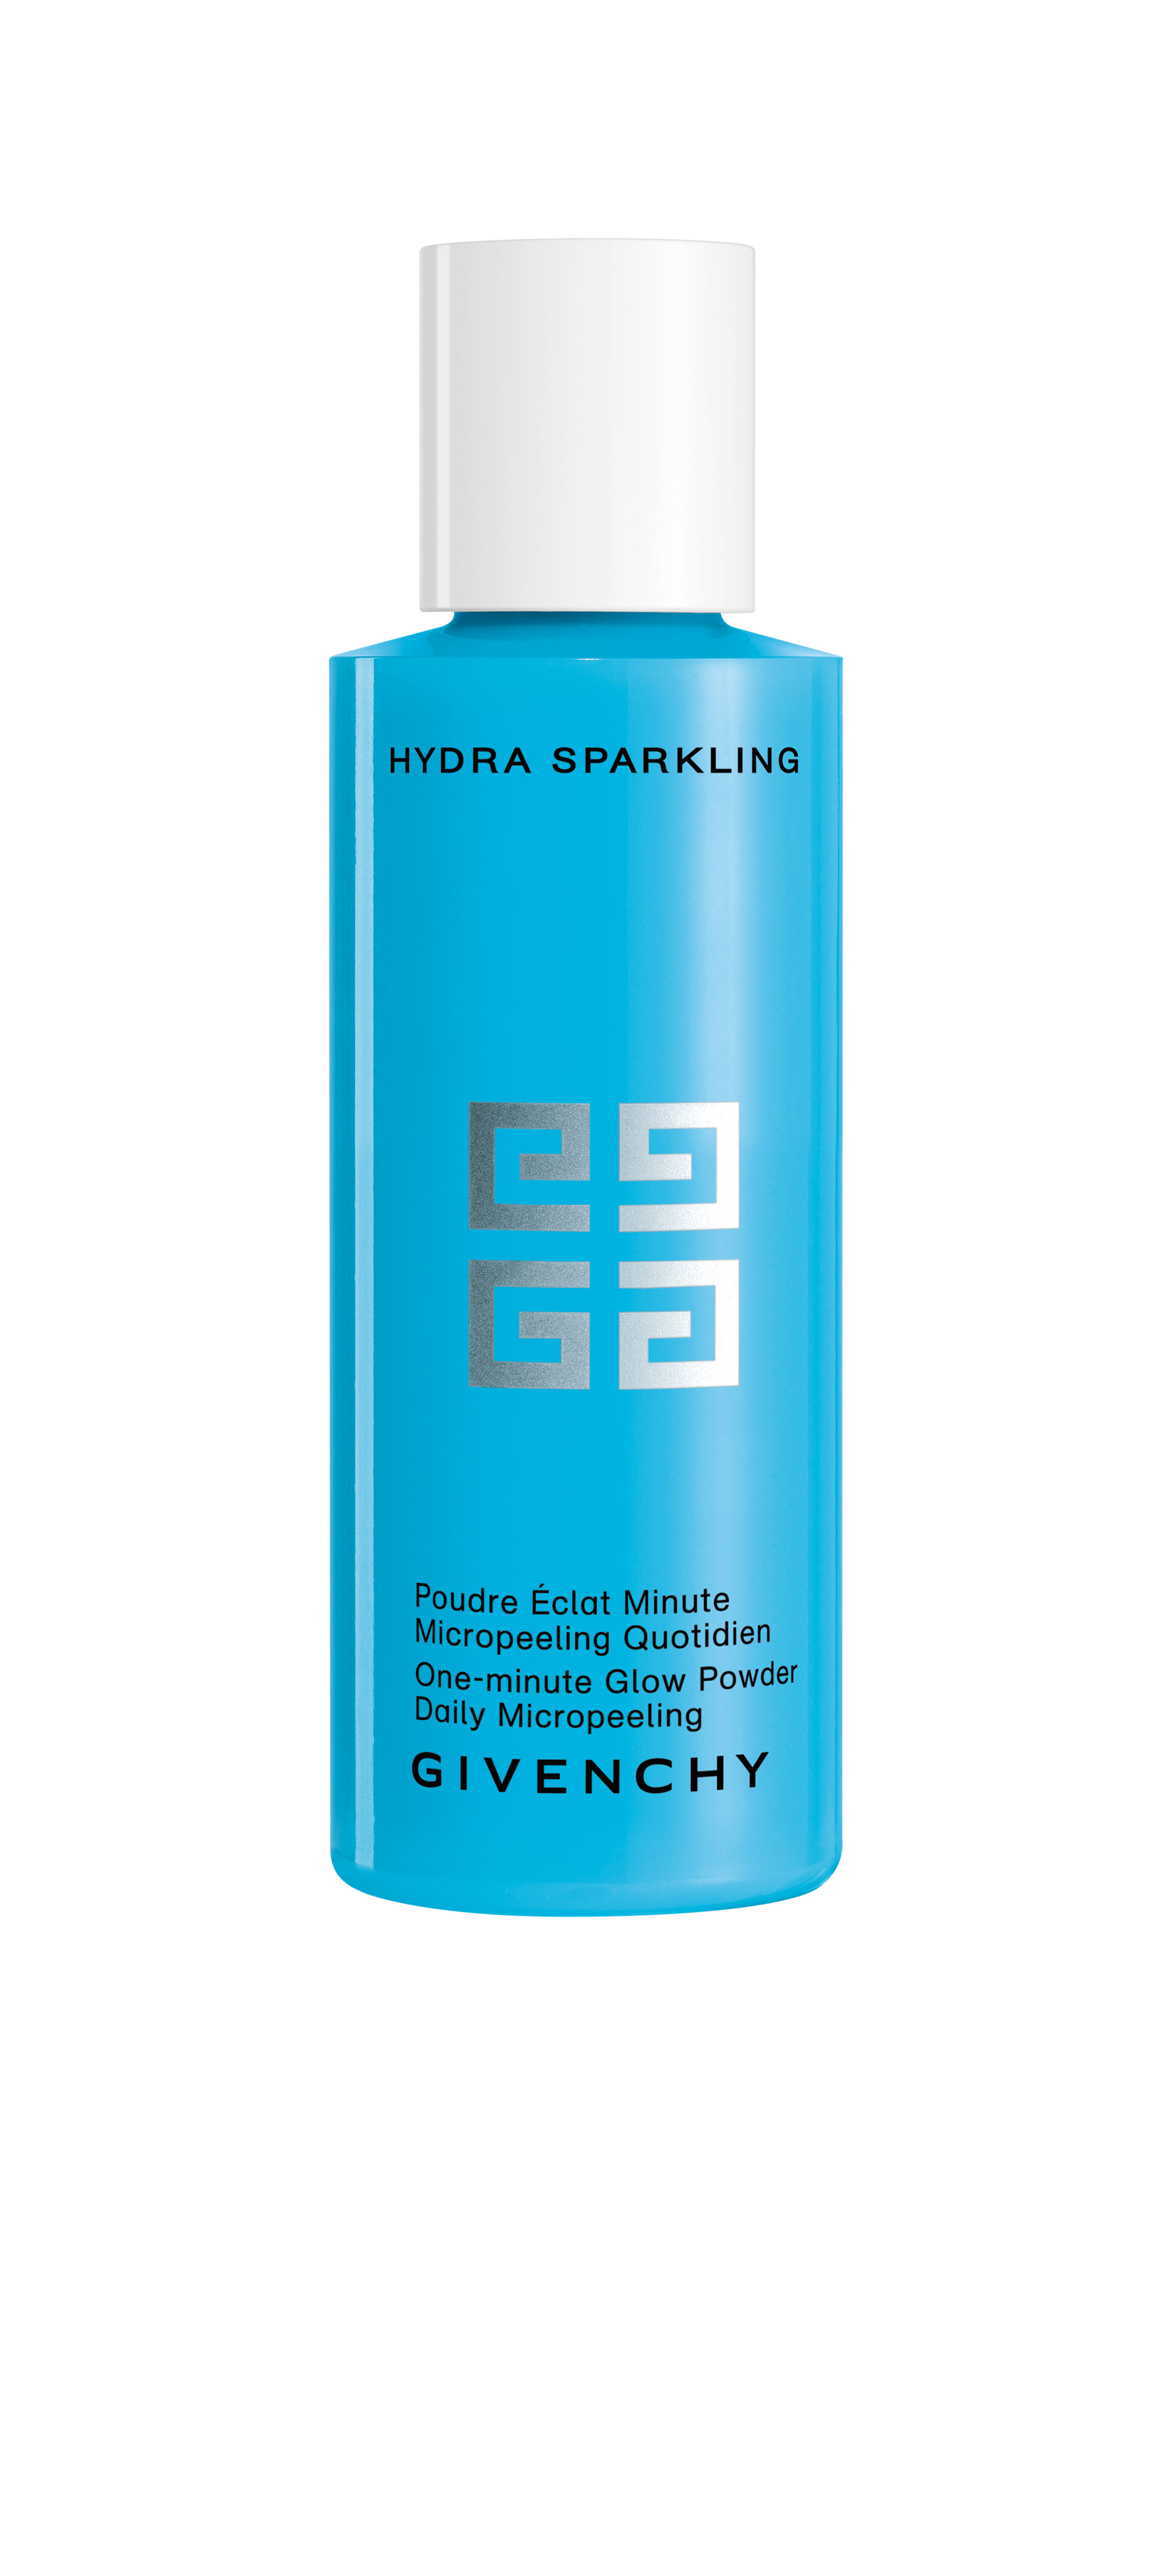 huid6---HYDRA-SPARKLING-Poudre-Nettoyante-2014-HD